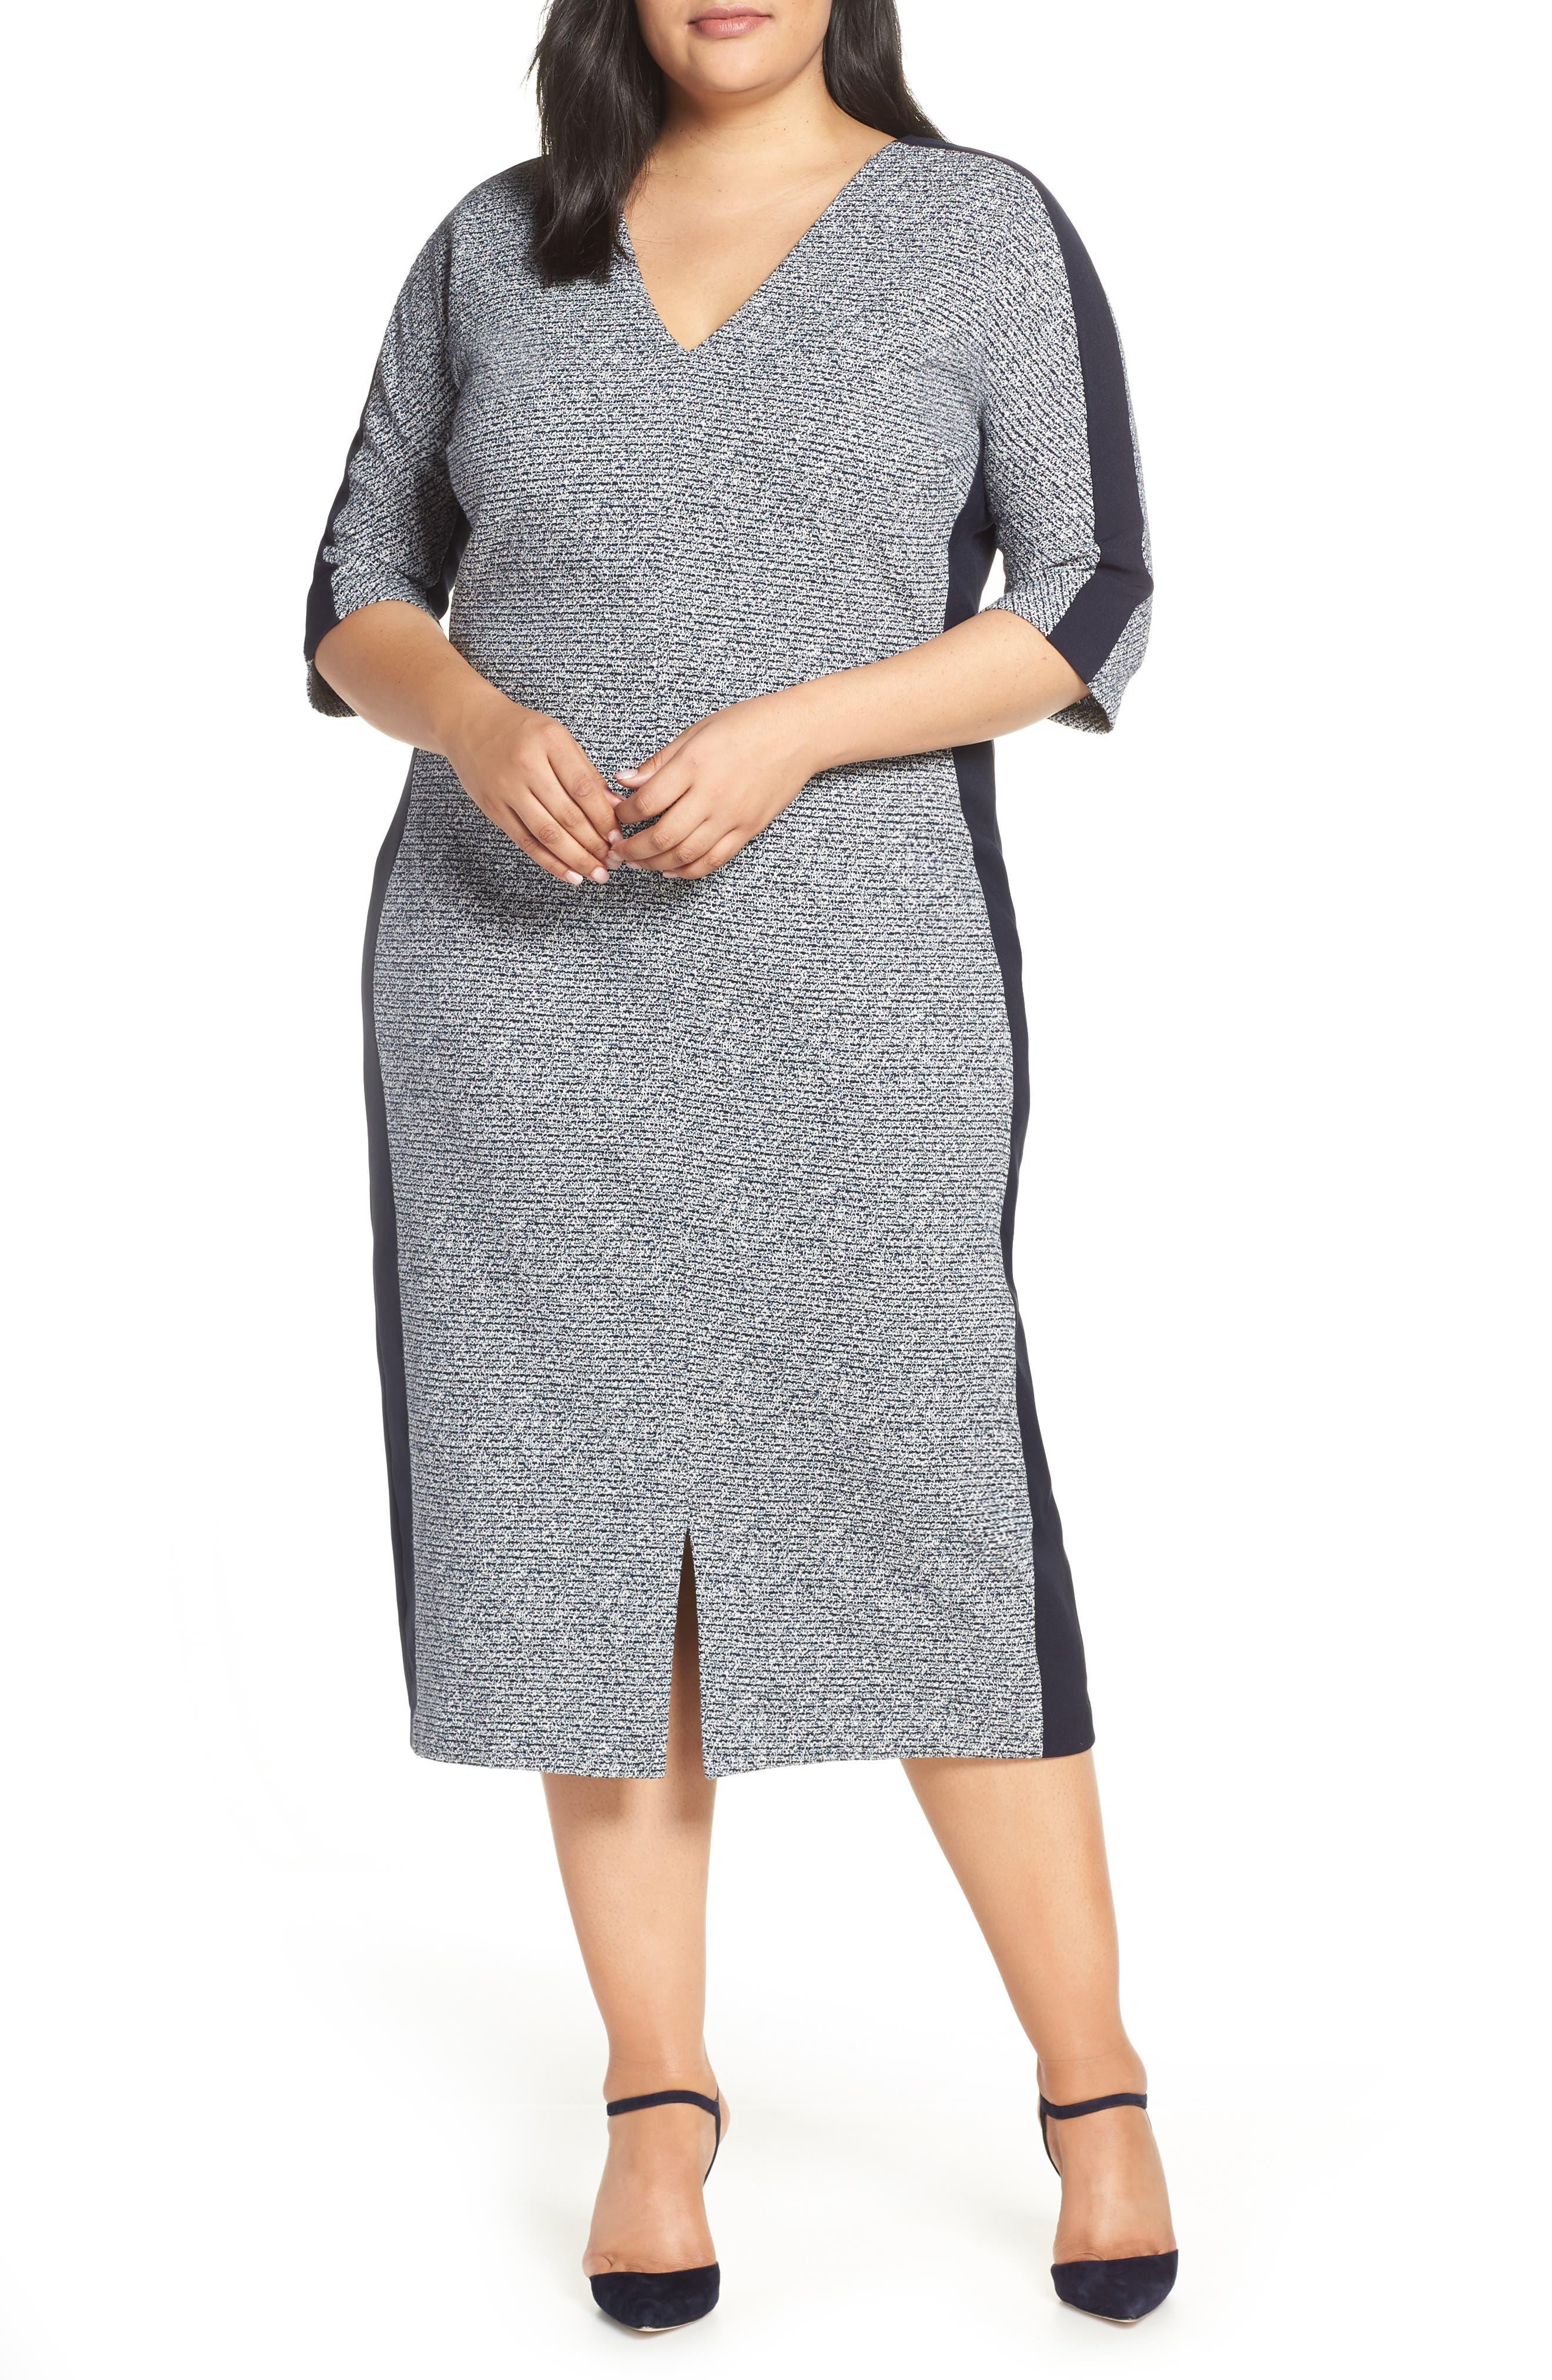 MAGGY LONDON, Metallic Ribbed Tweed V-Neck Sheath Dress, Main thumbnail 1, color, 462